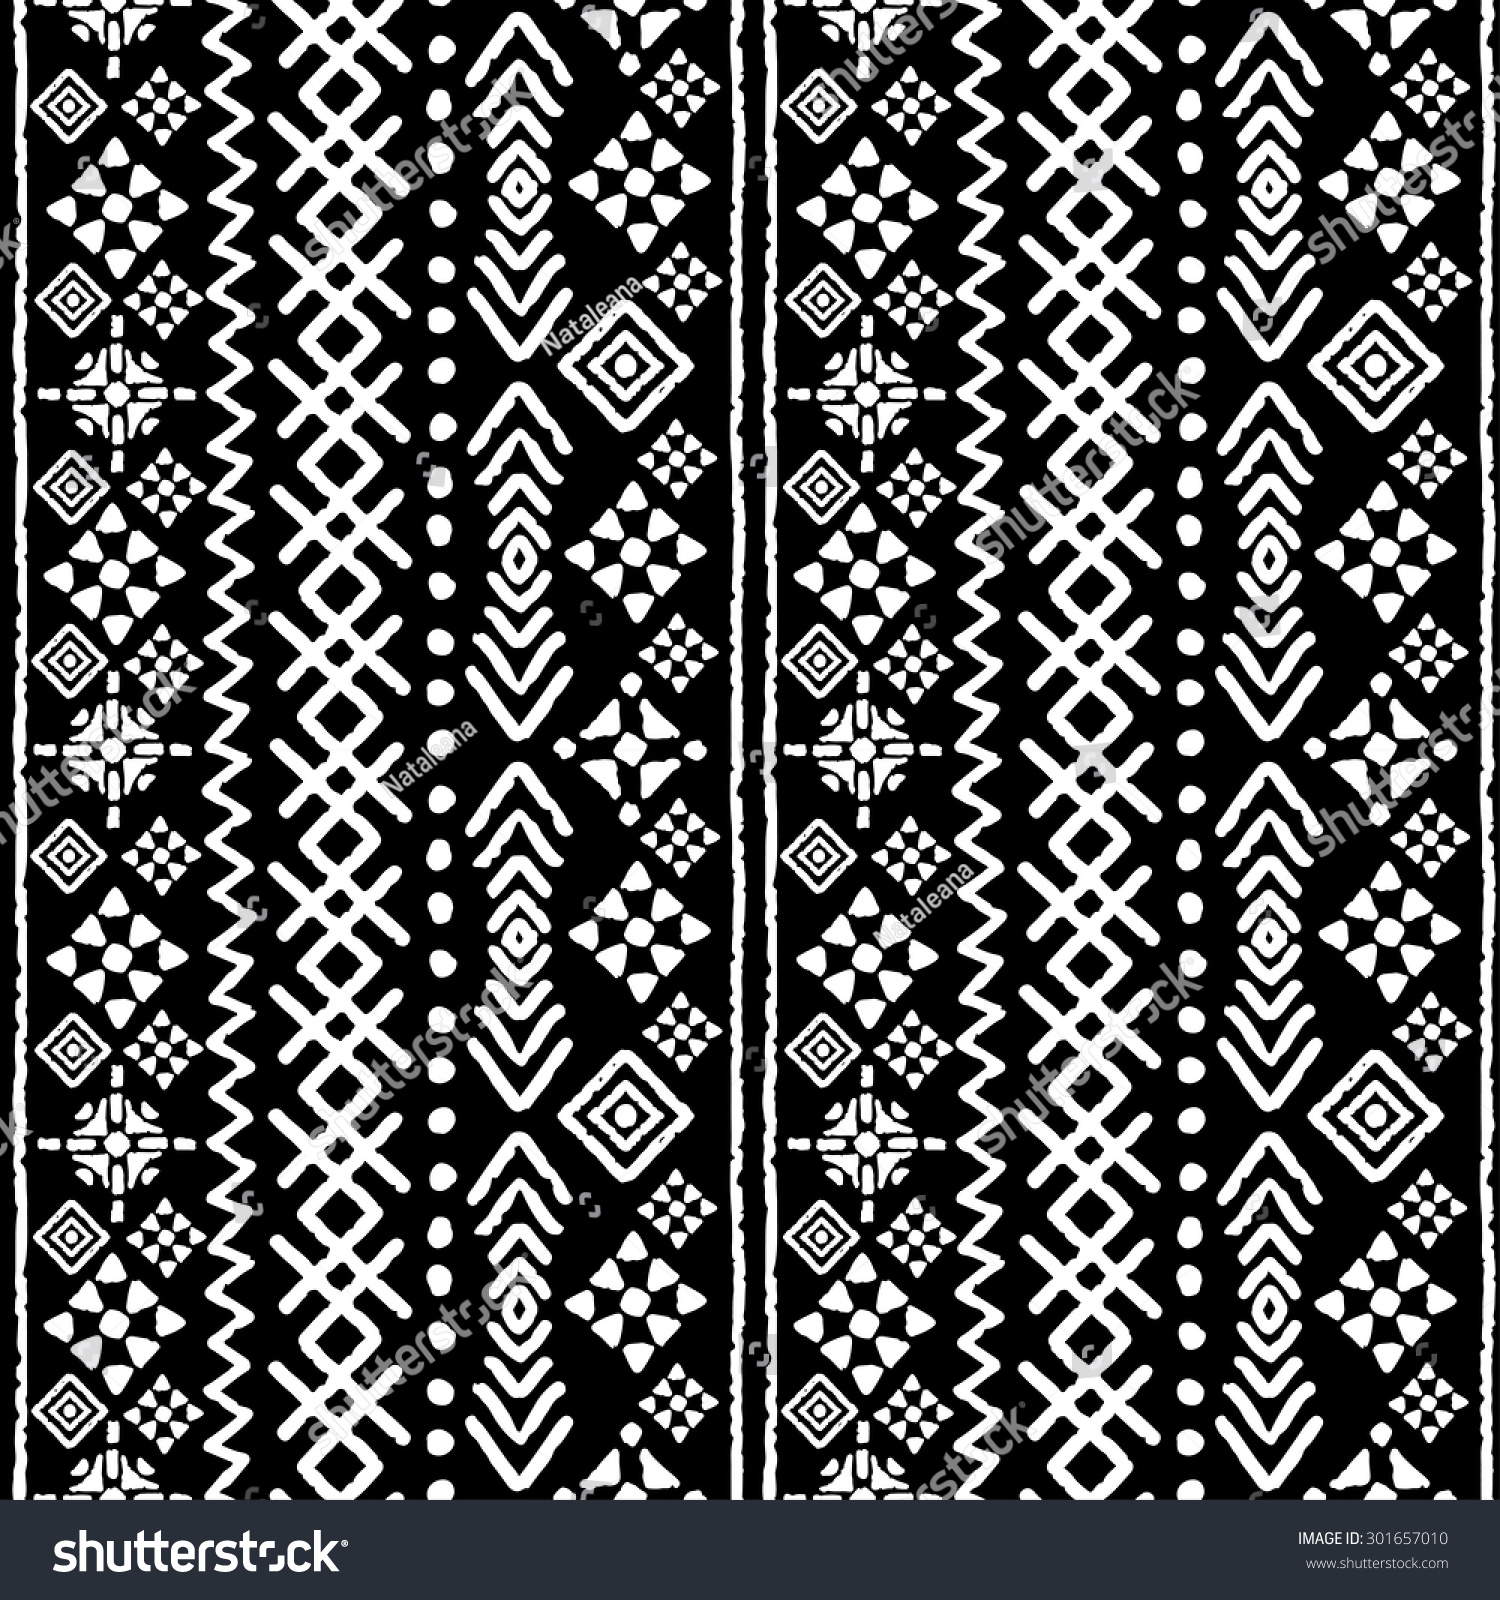 100 Tribal Arrows Boho Seamless Pattern Watercolor Boho